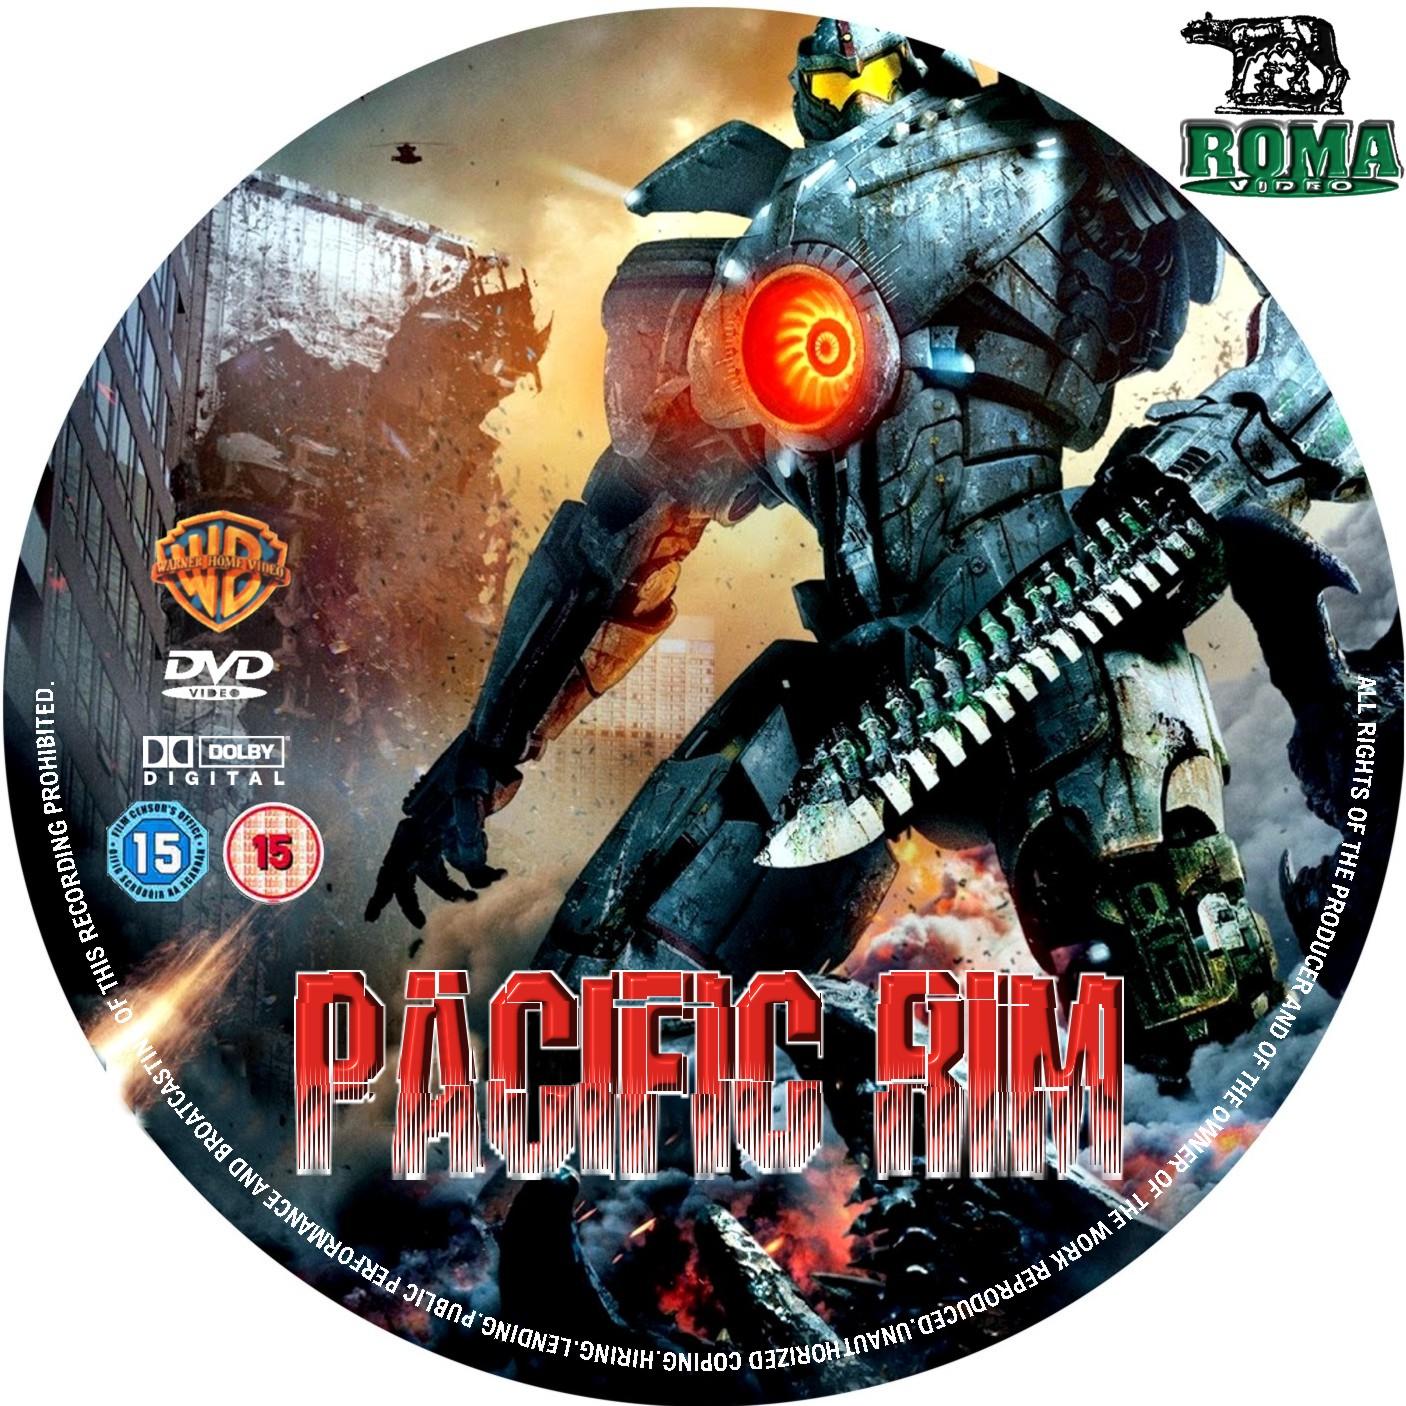 COVERS.BOX.SK ::: Pacific Rim 2013 - high quality DVD ... Pacific Rim 2013 Dvd Cover